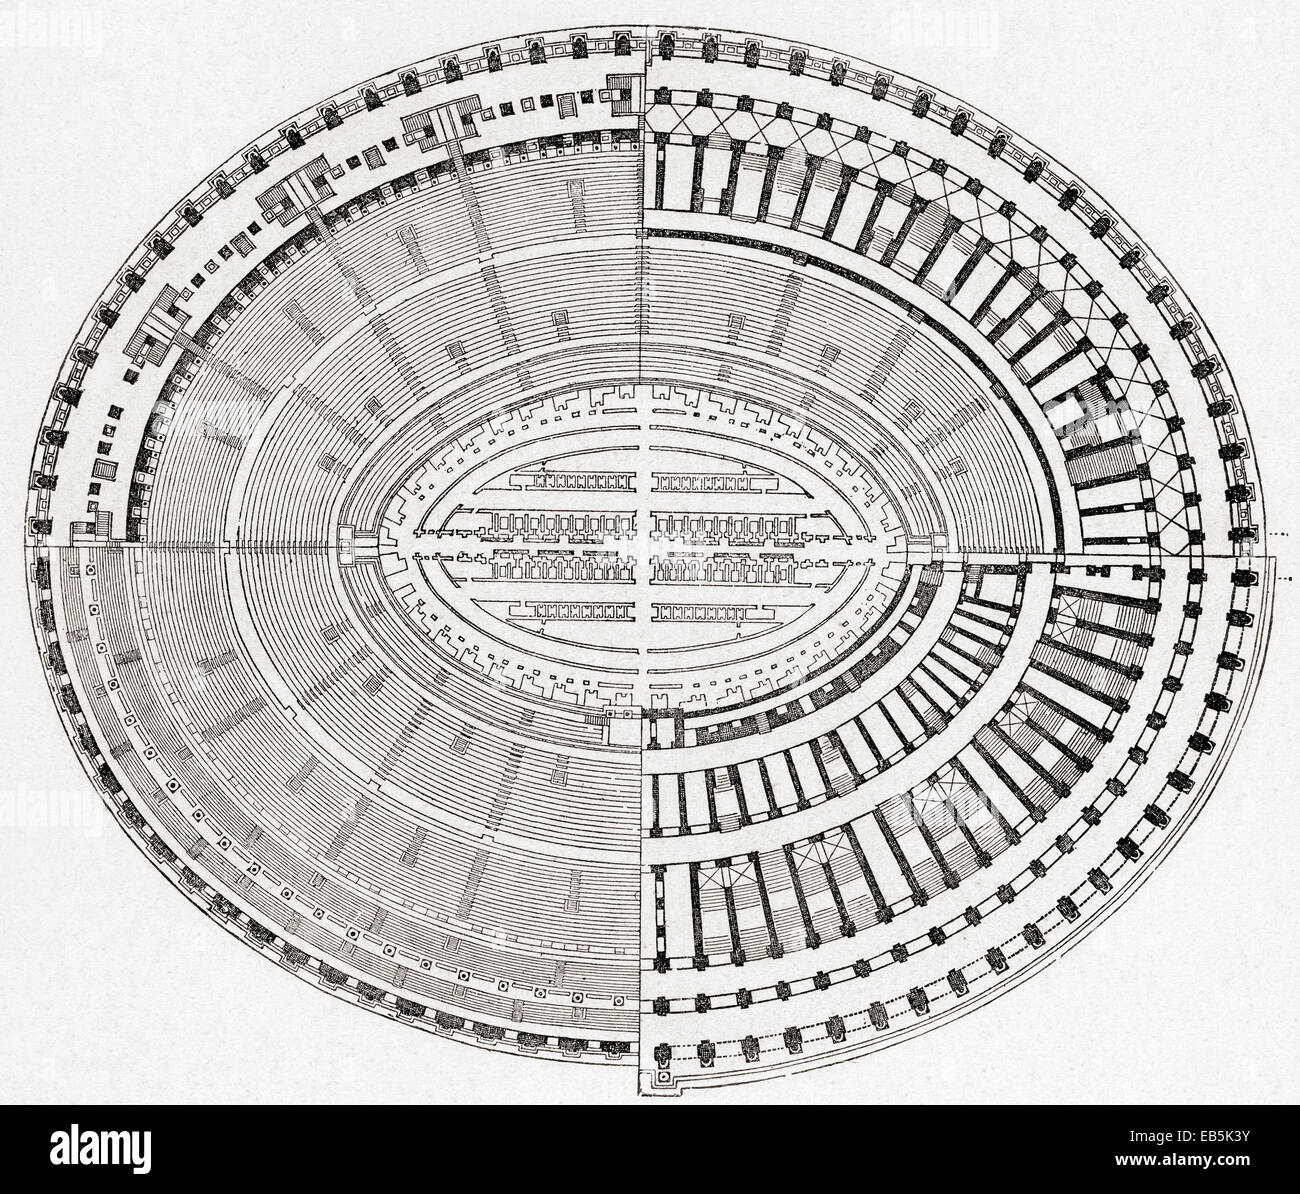 The Colosseum Or Coliseum Aka Flavian Amphitheatre Rome Italy Floor Plan From Kunstgeschichte In Bildern Stock Photo Alamy